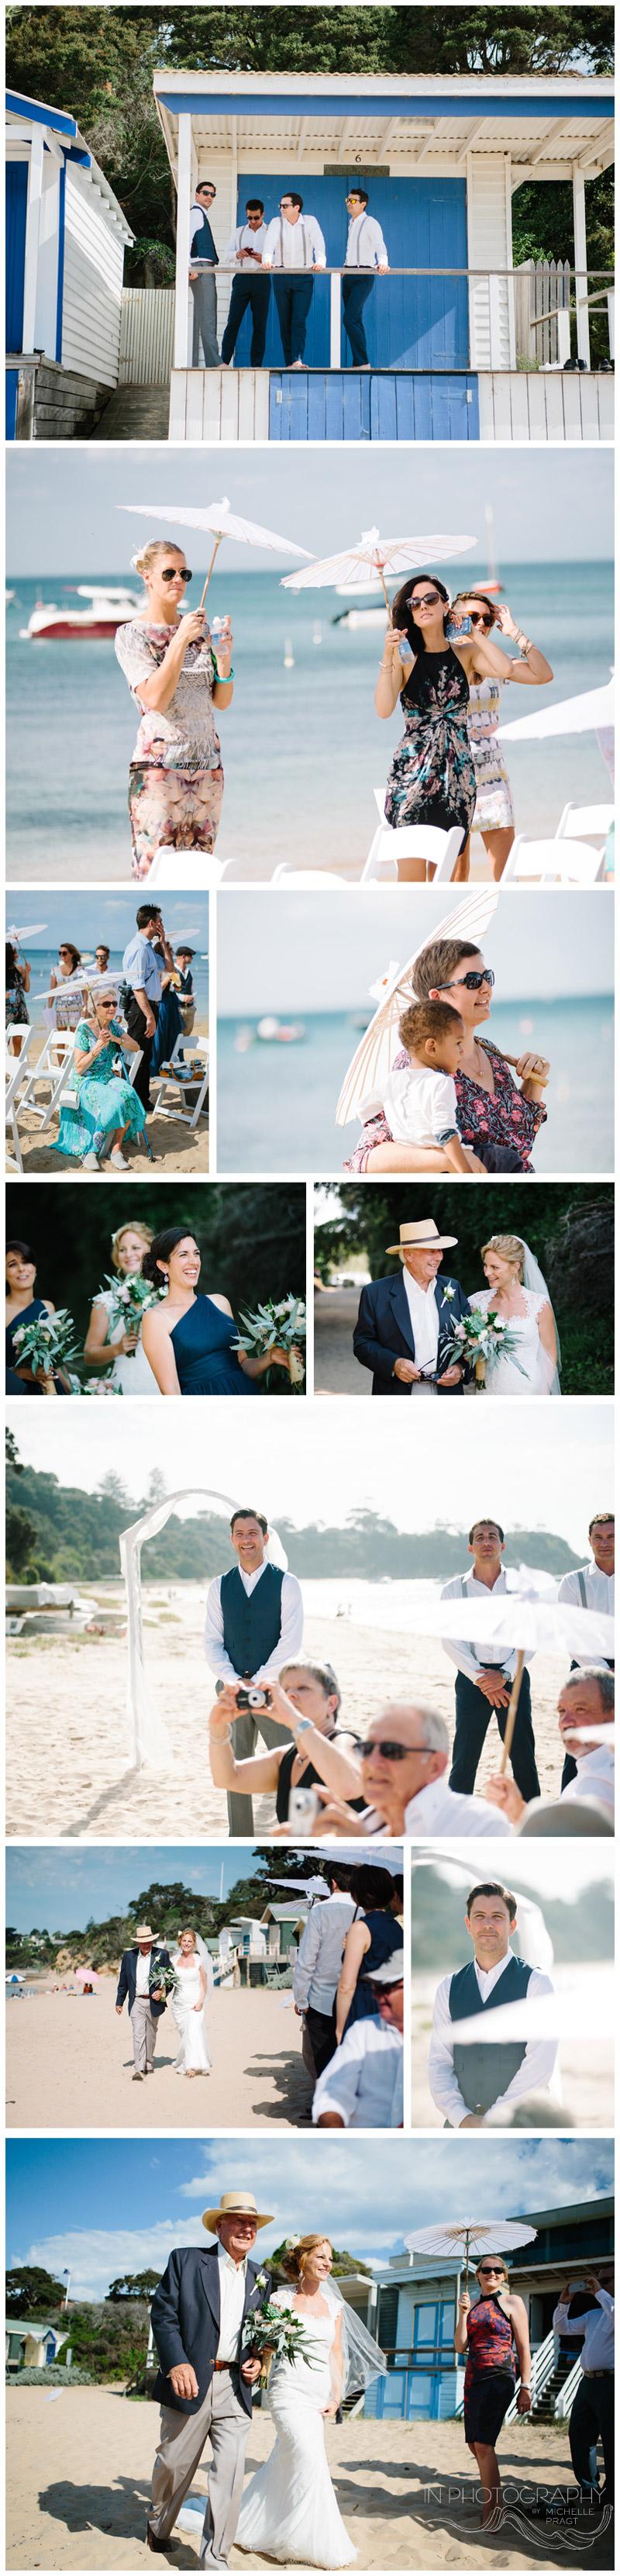 Portsea Beach wedding ceremony